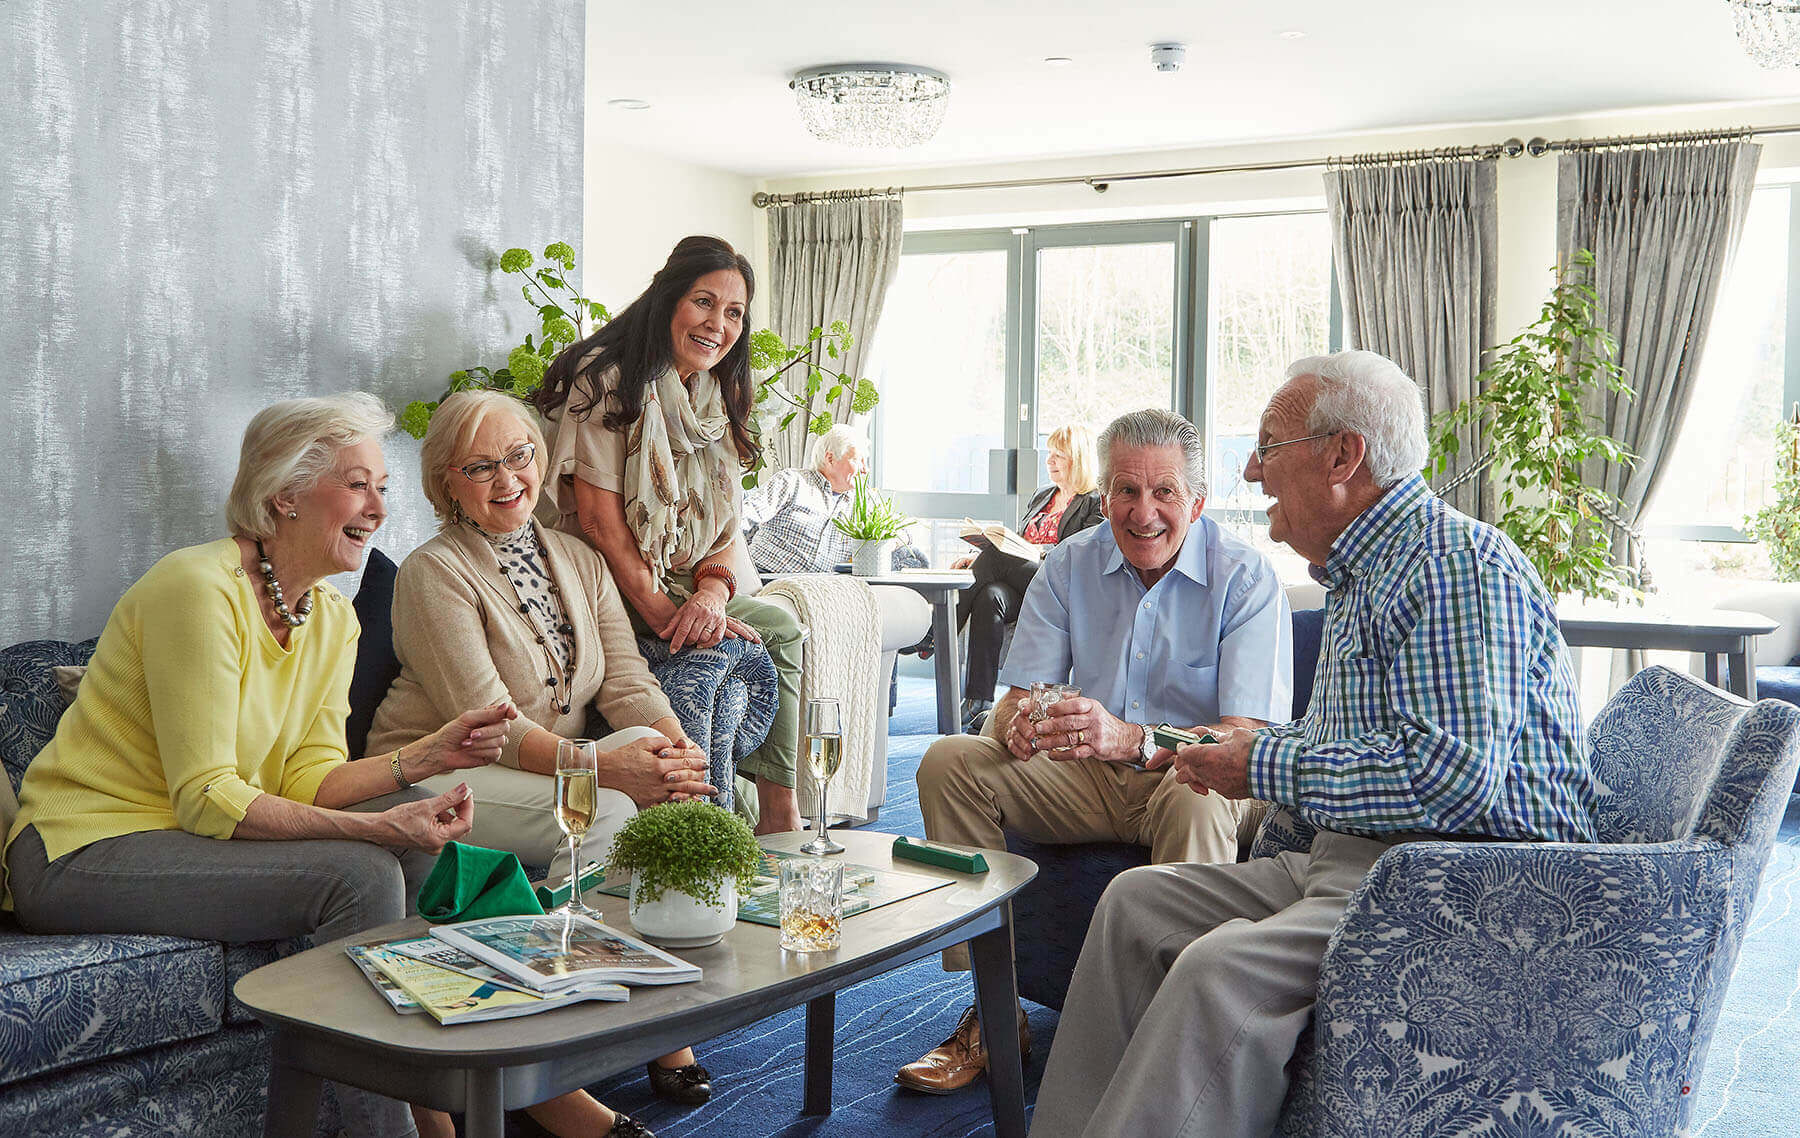 Adlington Life Community